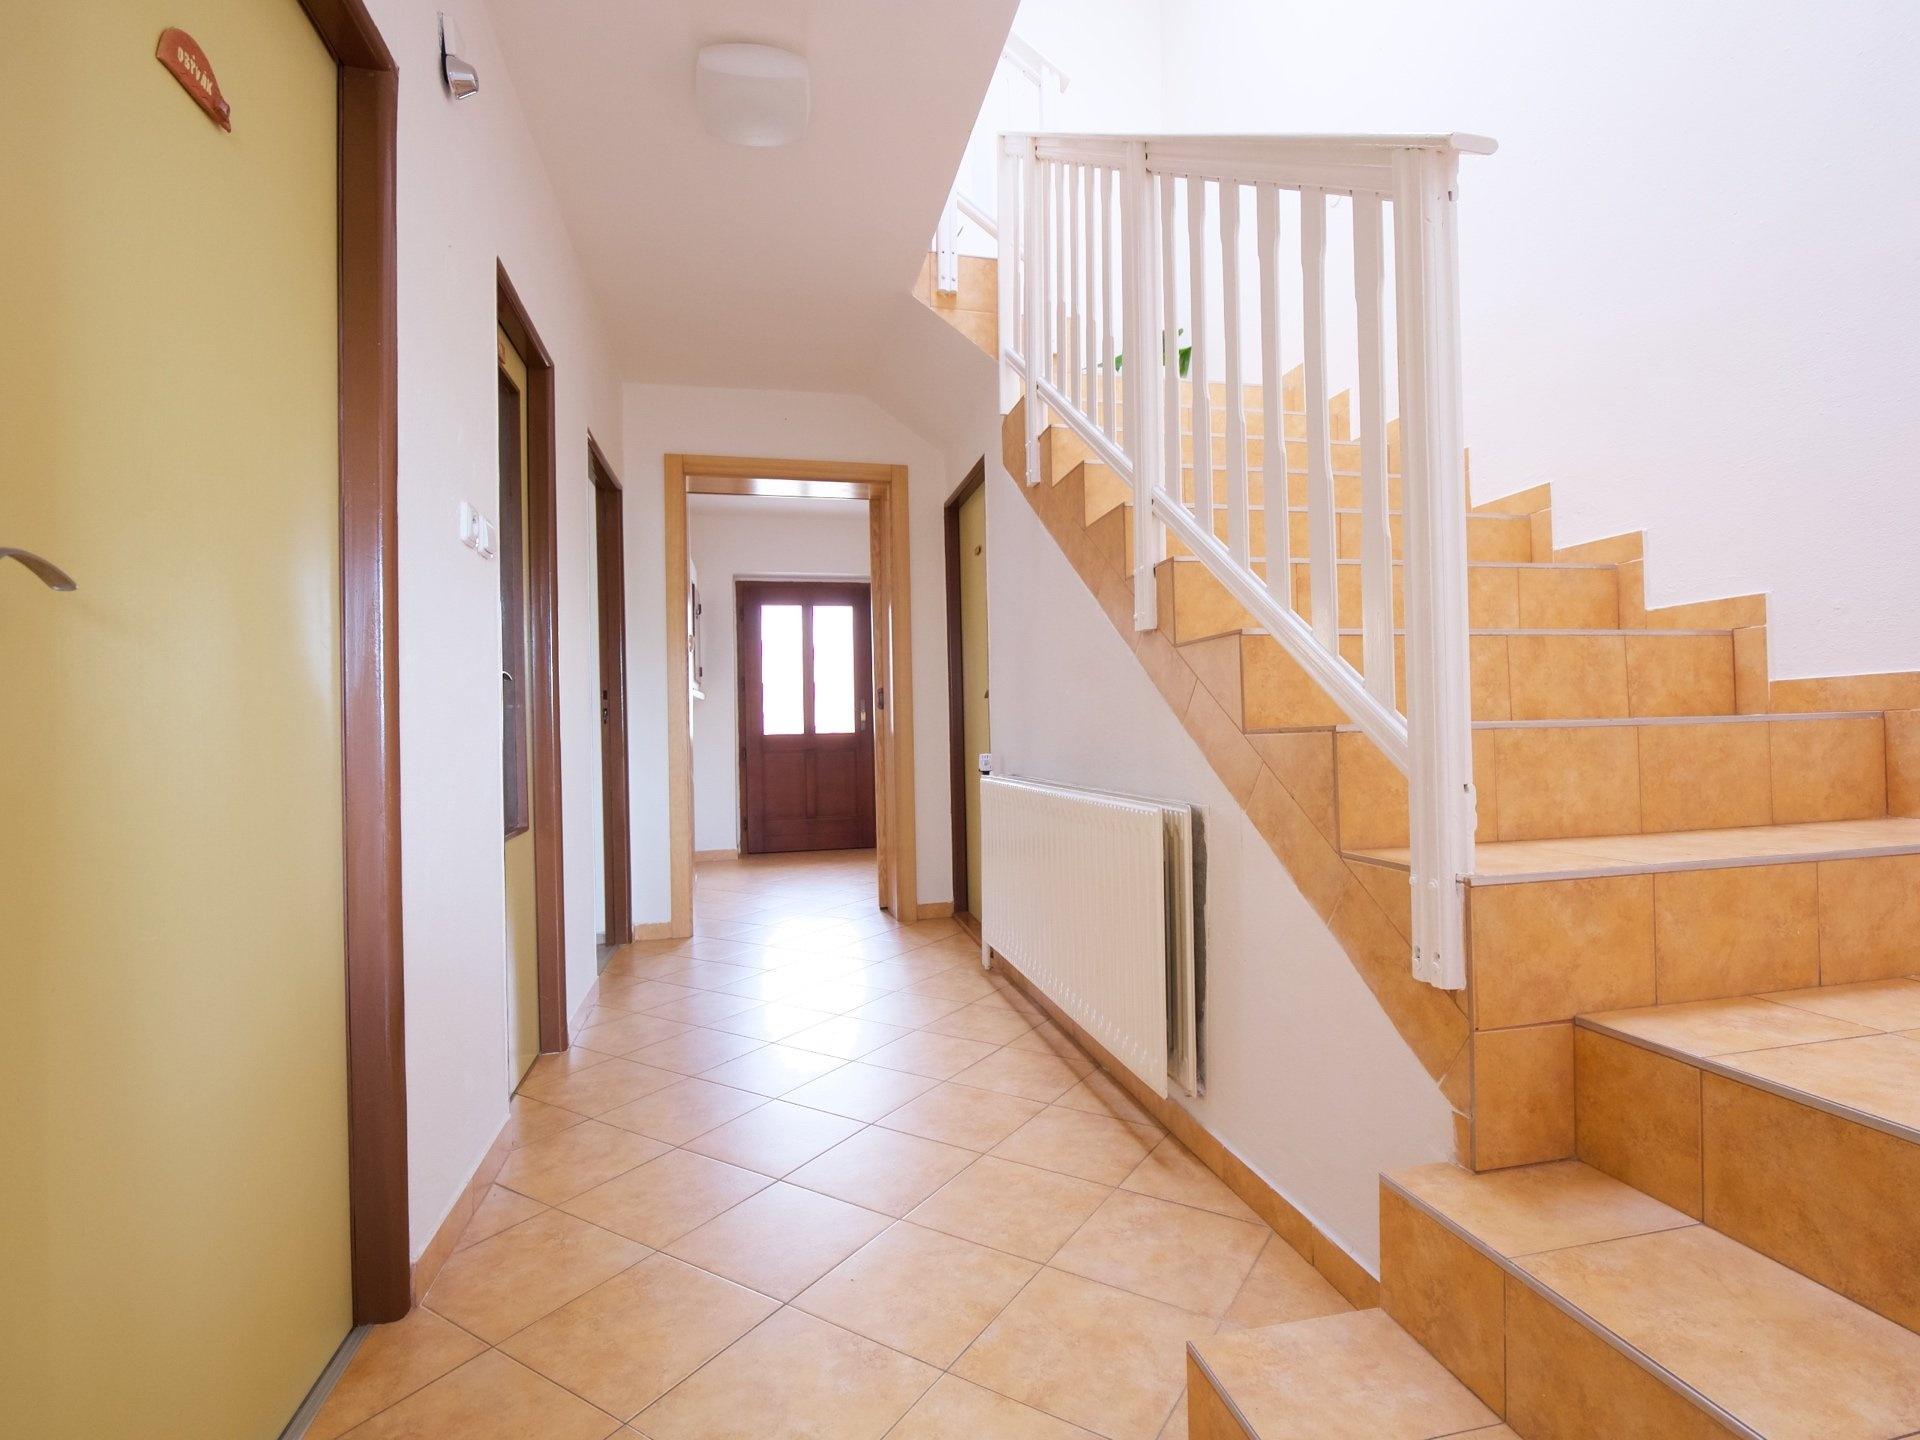 prodej-rodinneho-domu-letohrad-p1210746-8691ba